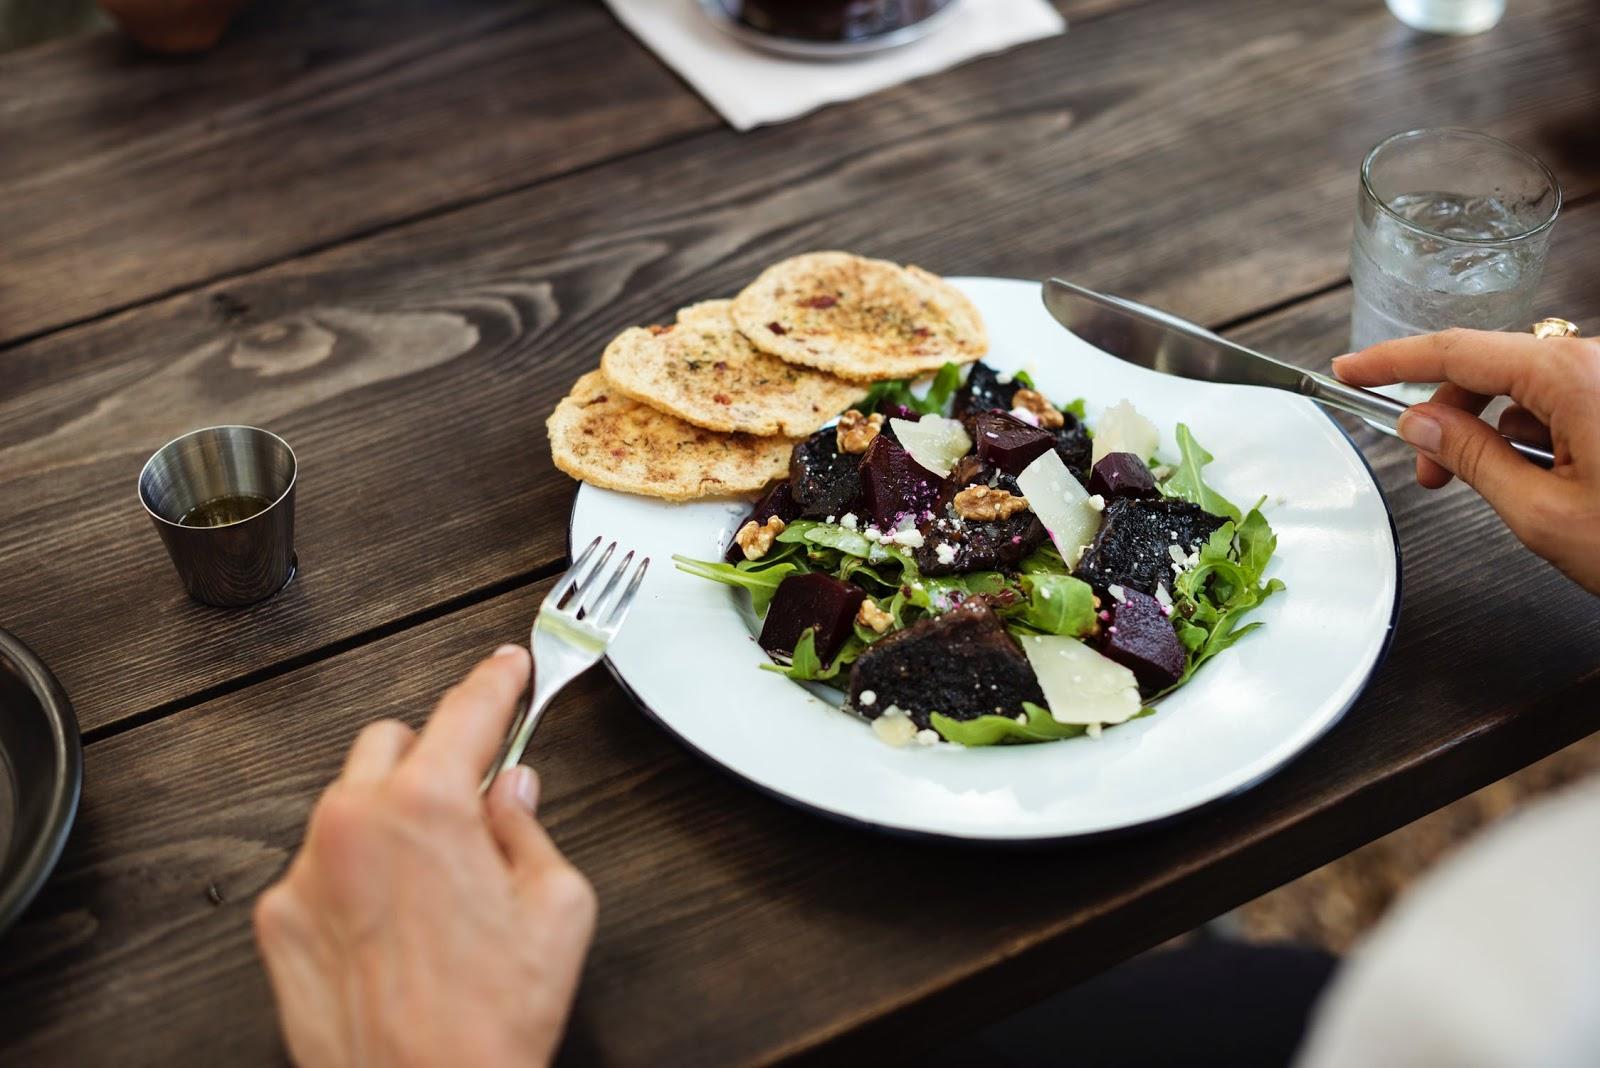 Heart-healthy meals: a beet salad